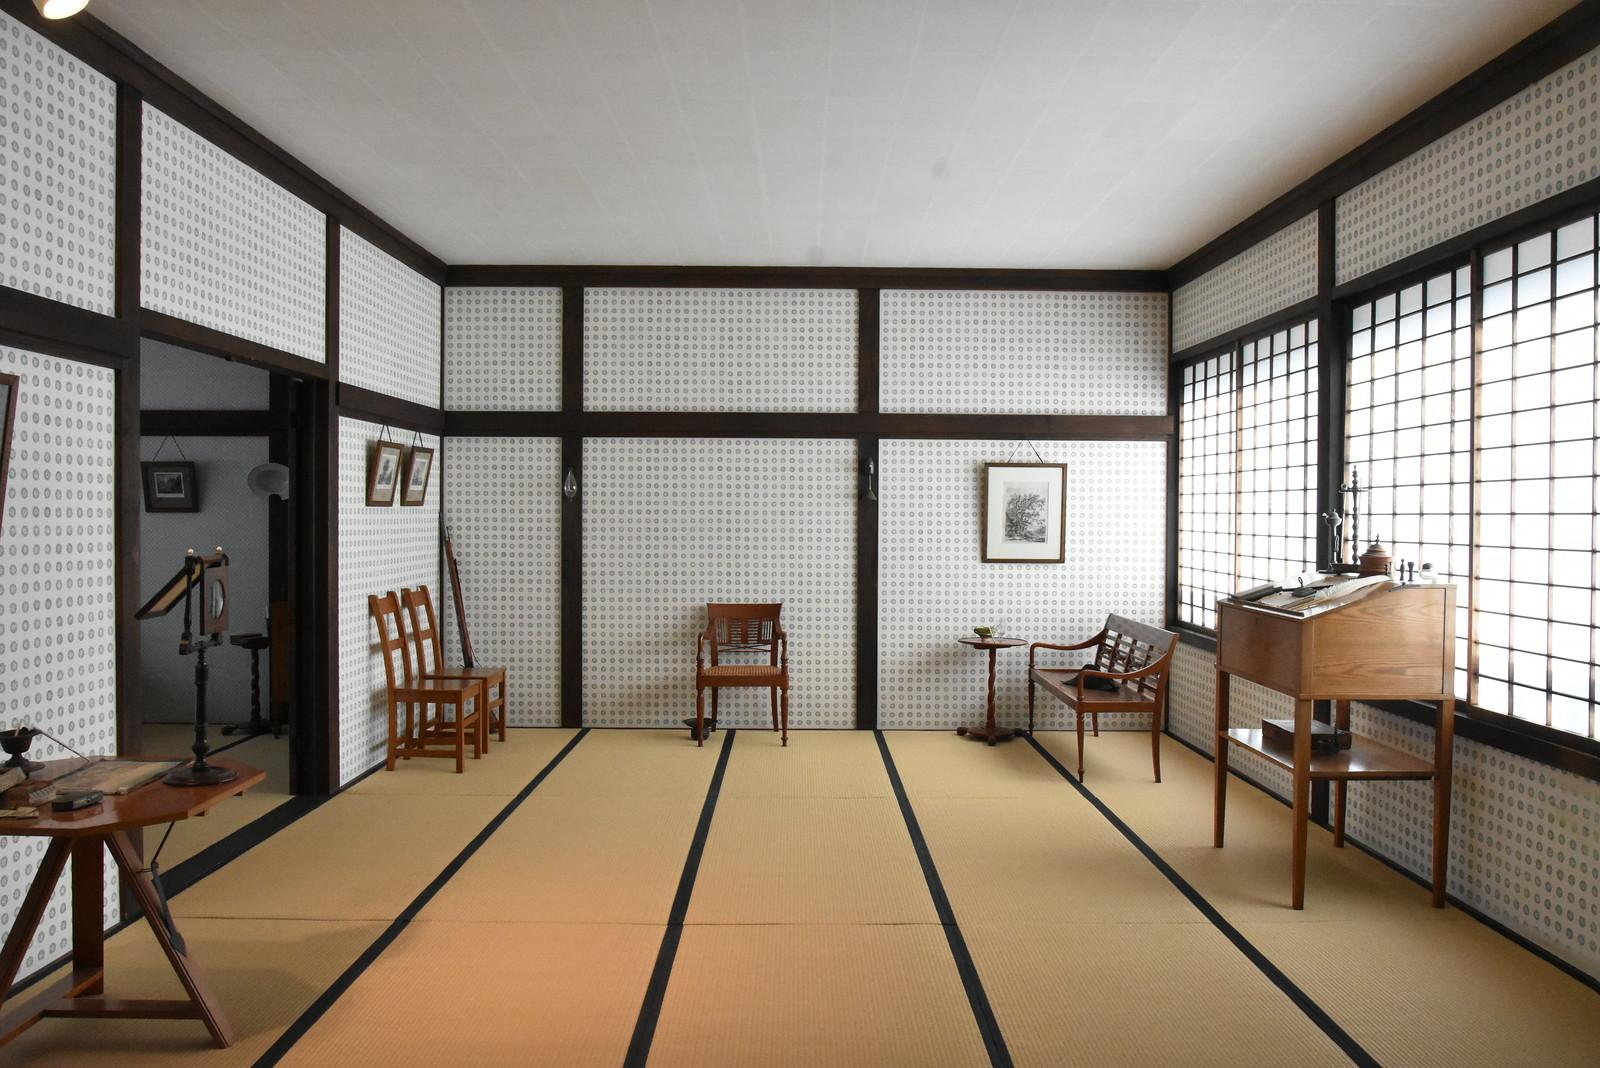 Dejima - Comptoir hollandais à Nagasaki